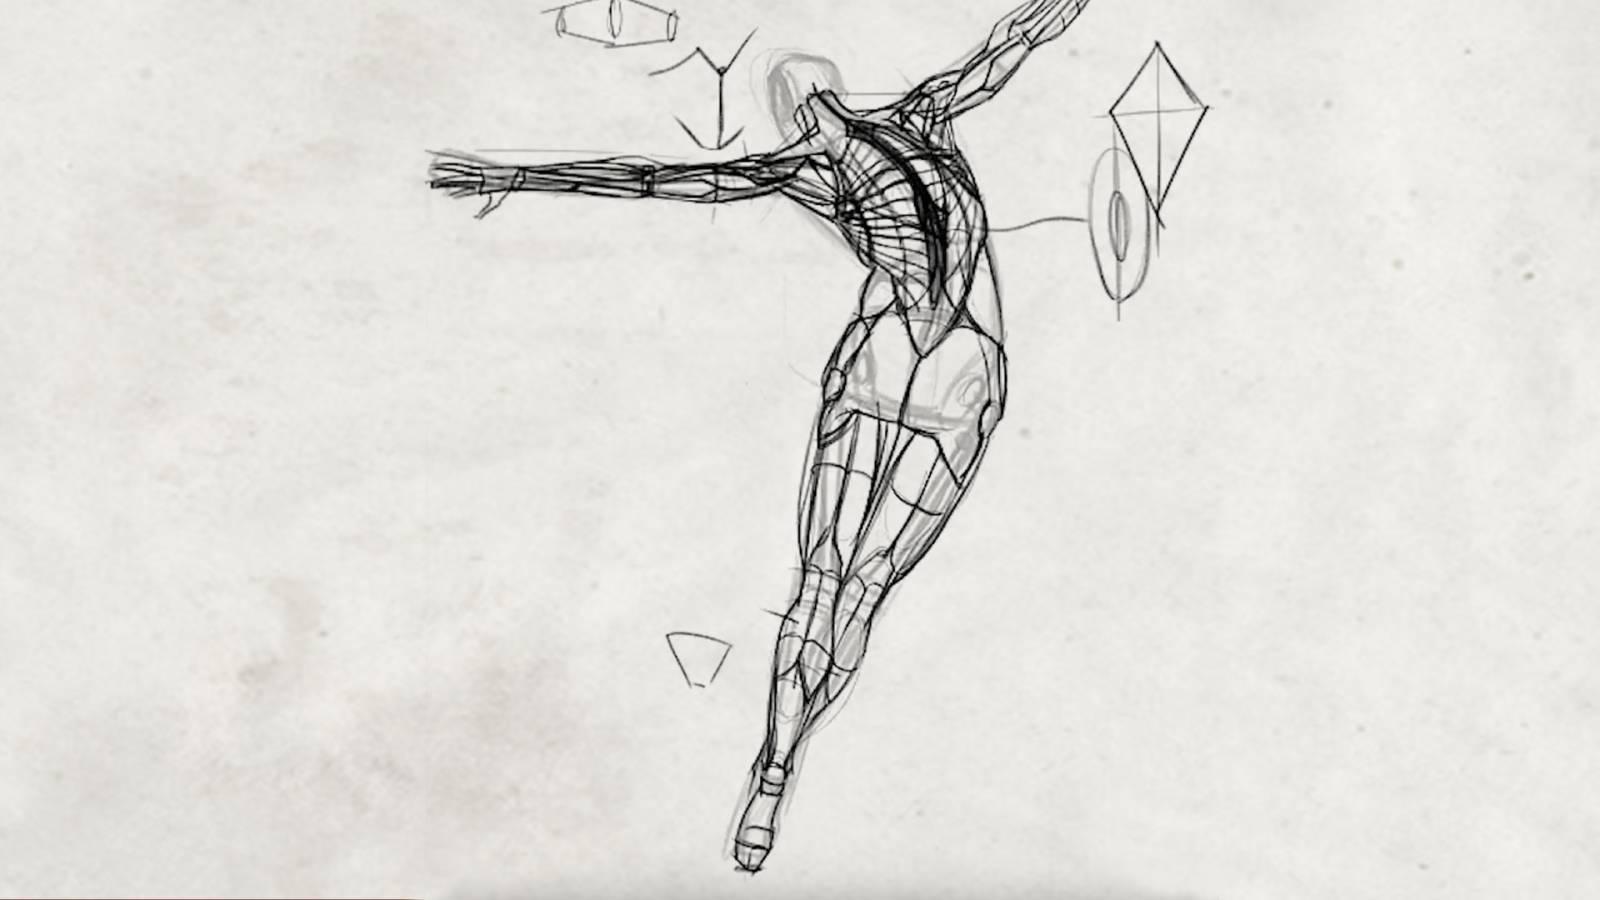 Constructing the Human Figure